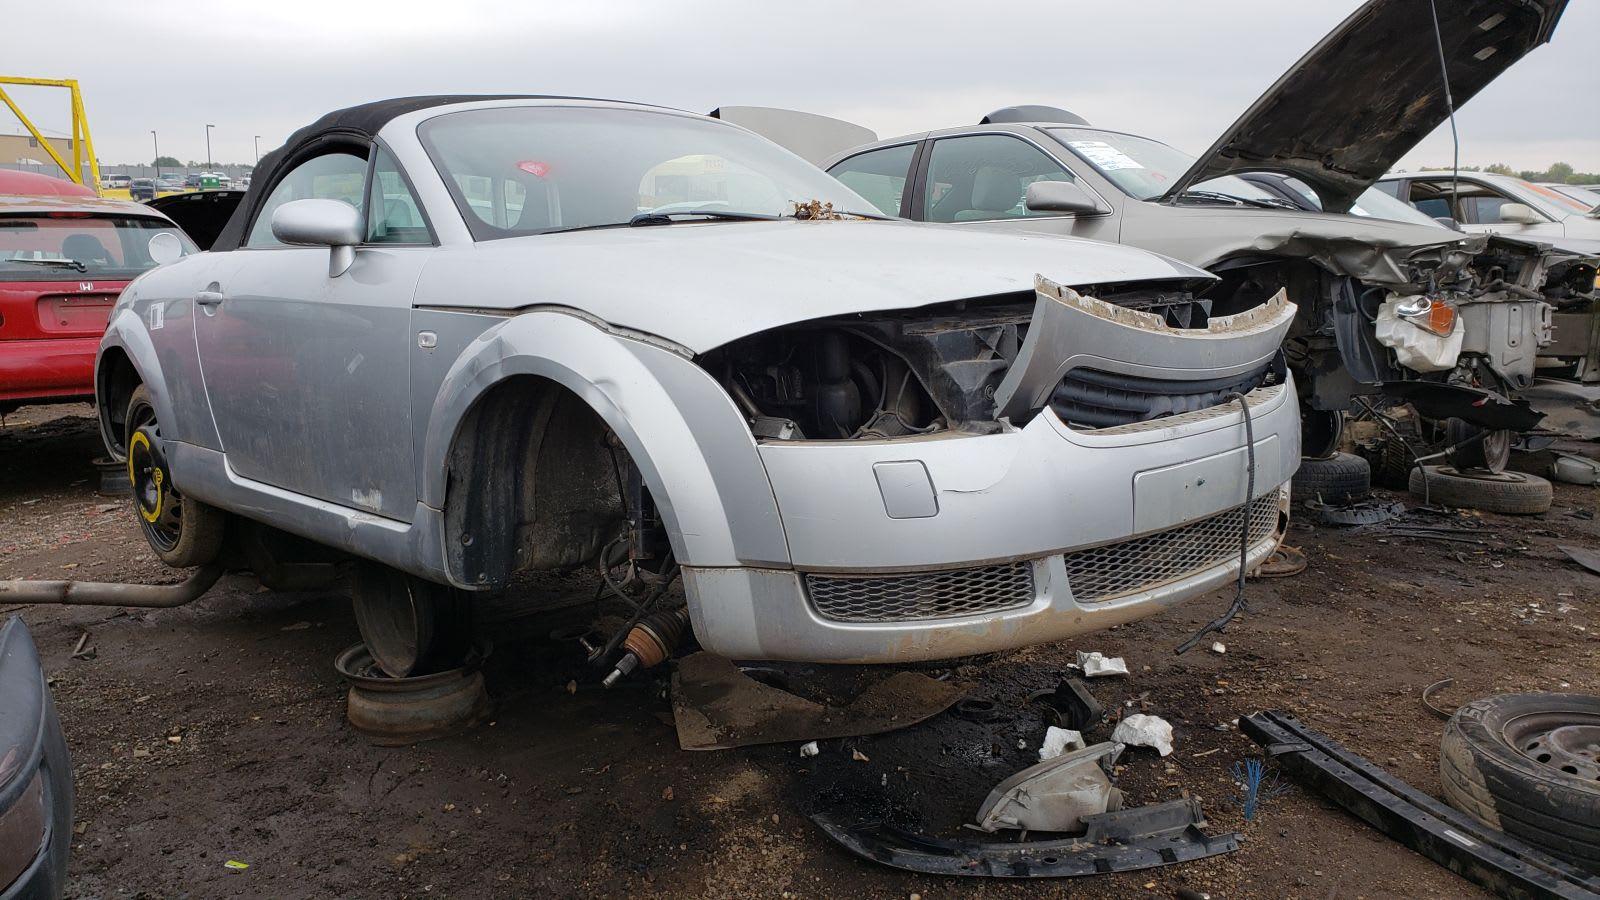 2001 Audi Tt Quattro Roadster In Colorado Wrecking Yard